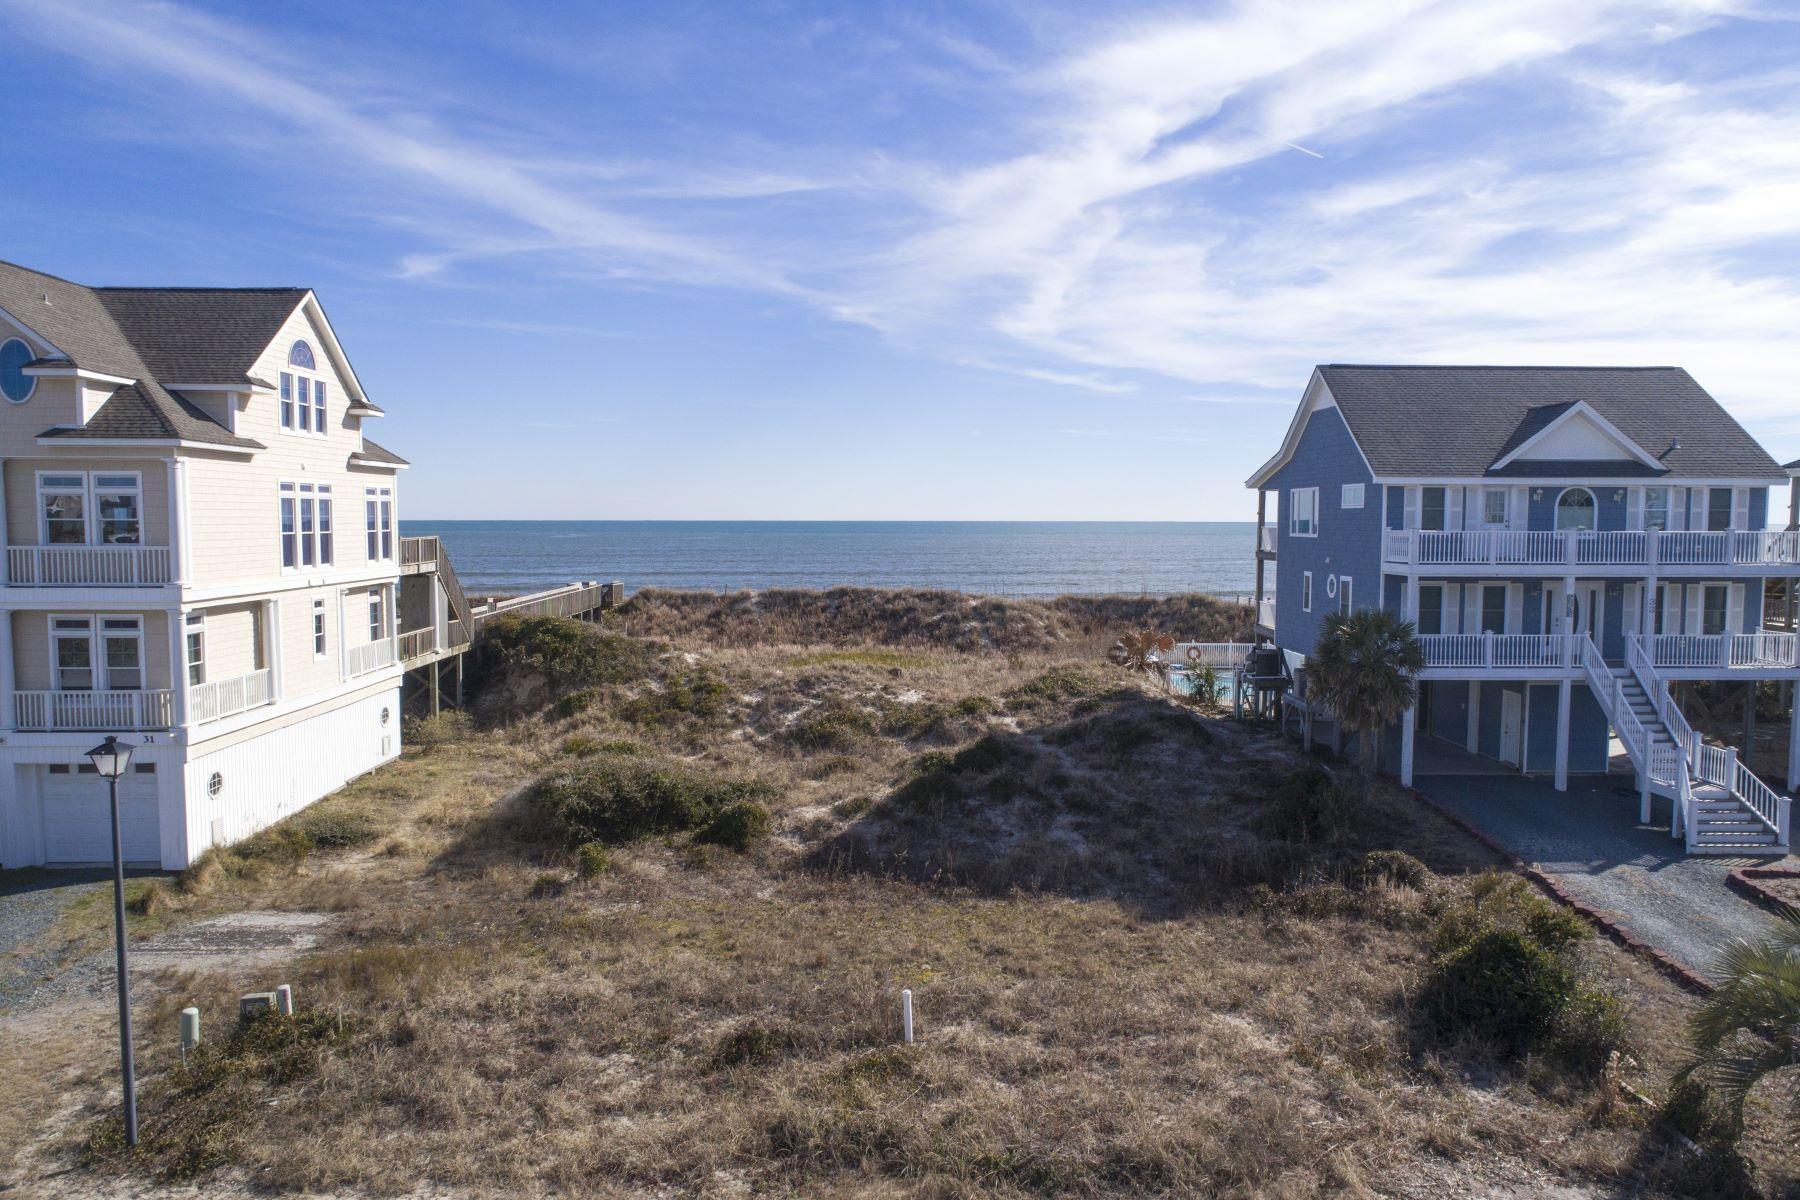 Земля для того Продажа на Oceanfront Lot in Dolphins Shores 32 Porpoise Place, N Topsail Beach, Северная Каролина, 28460 Соединенные Штаты